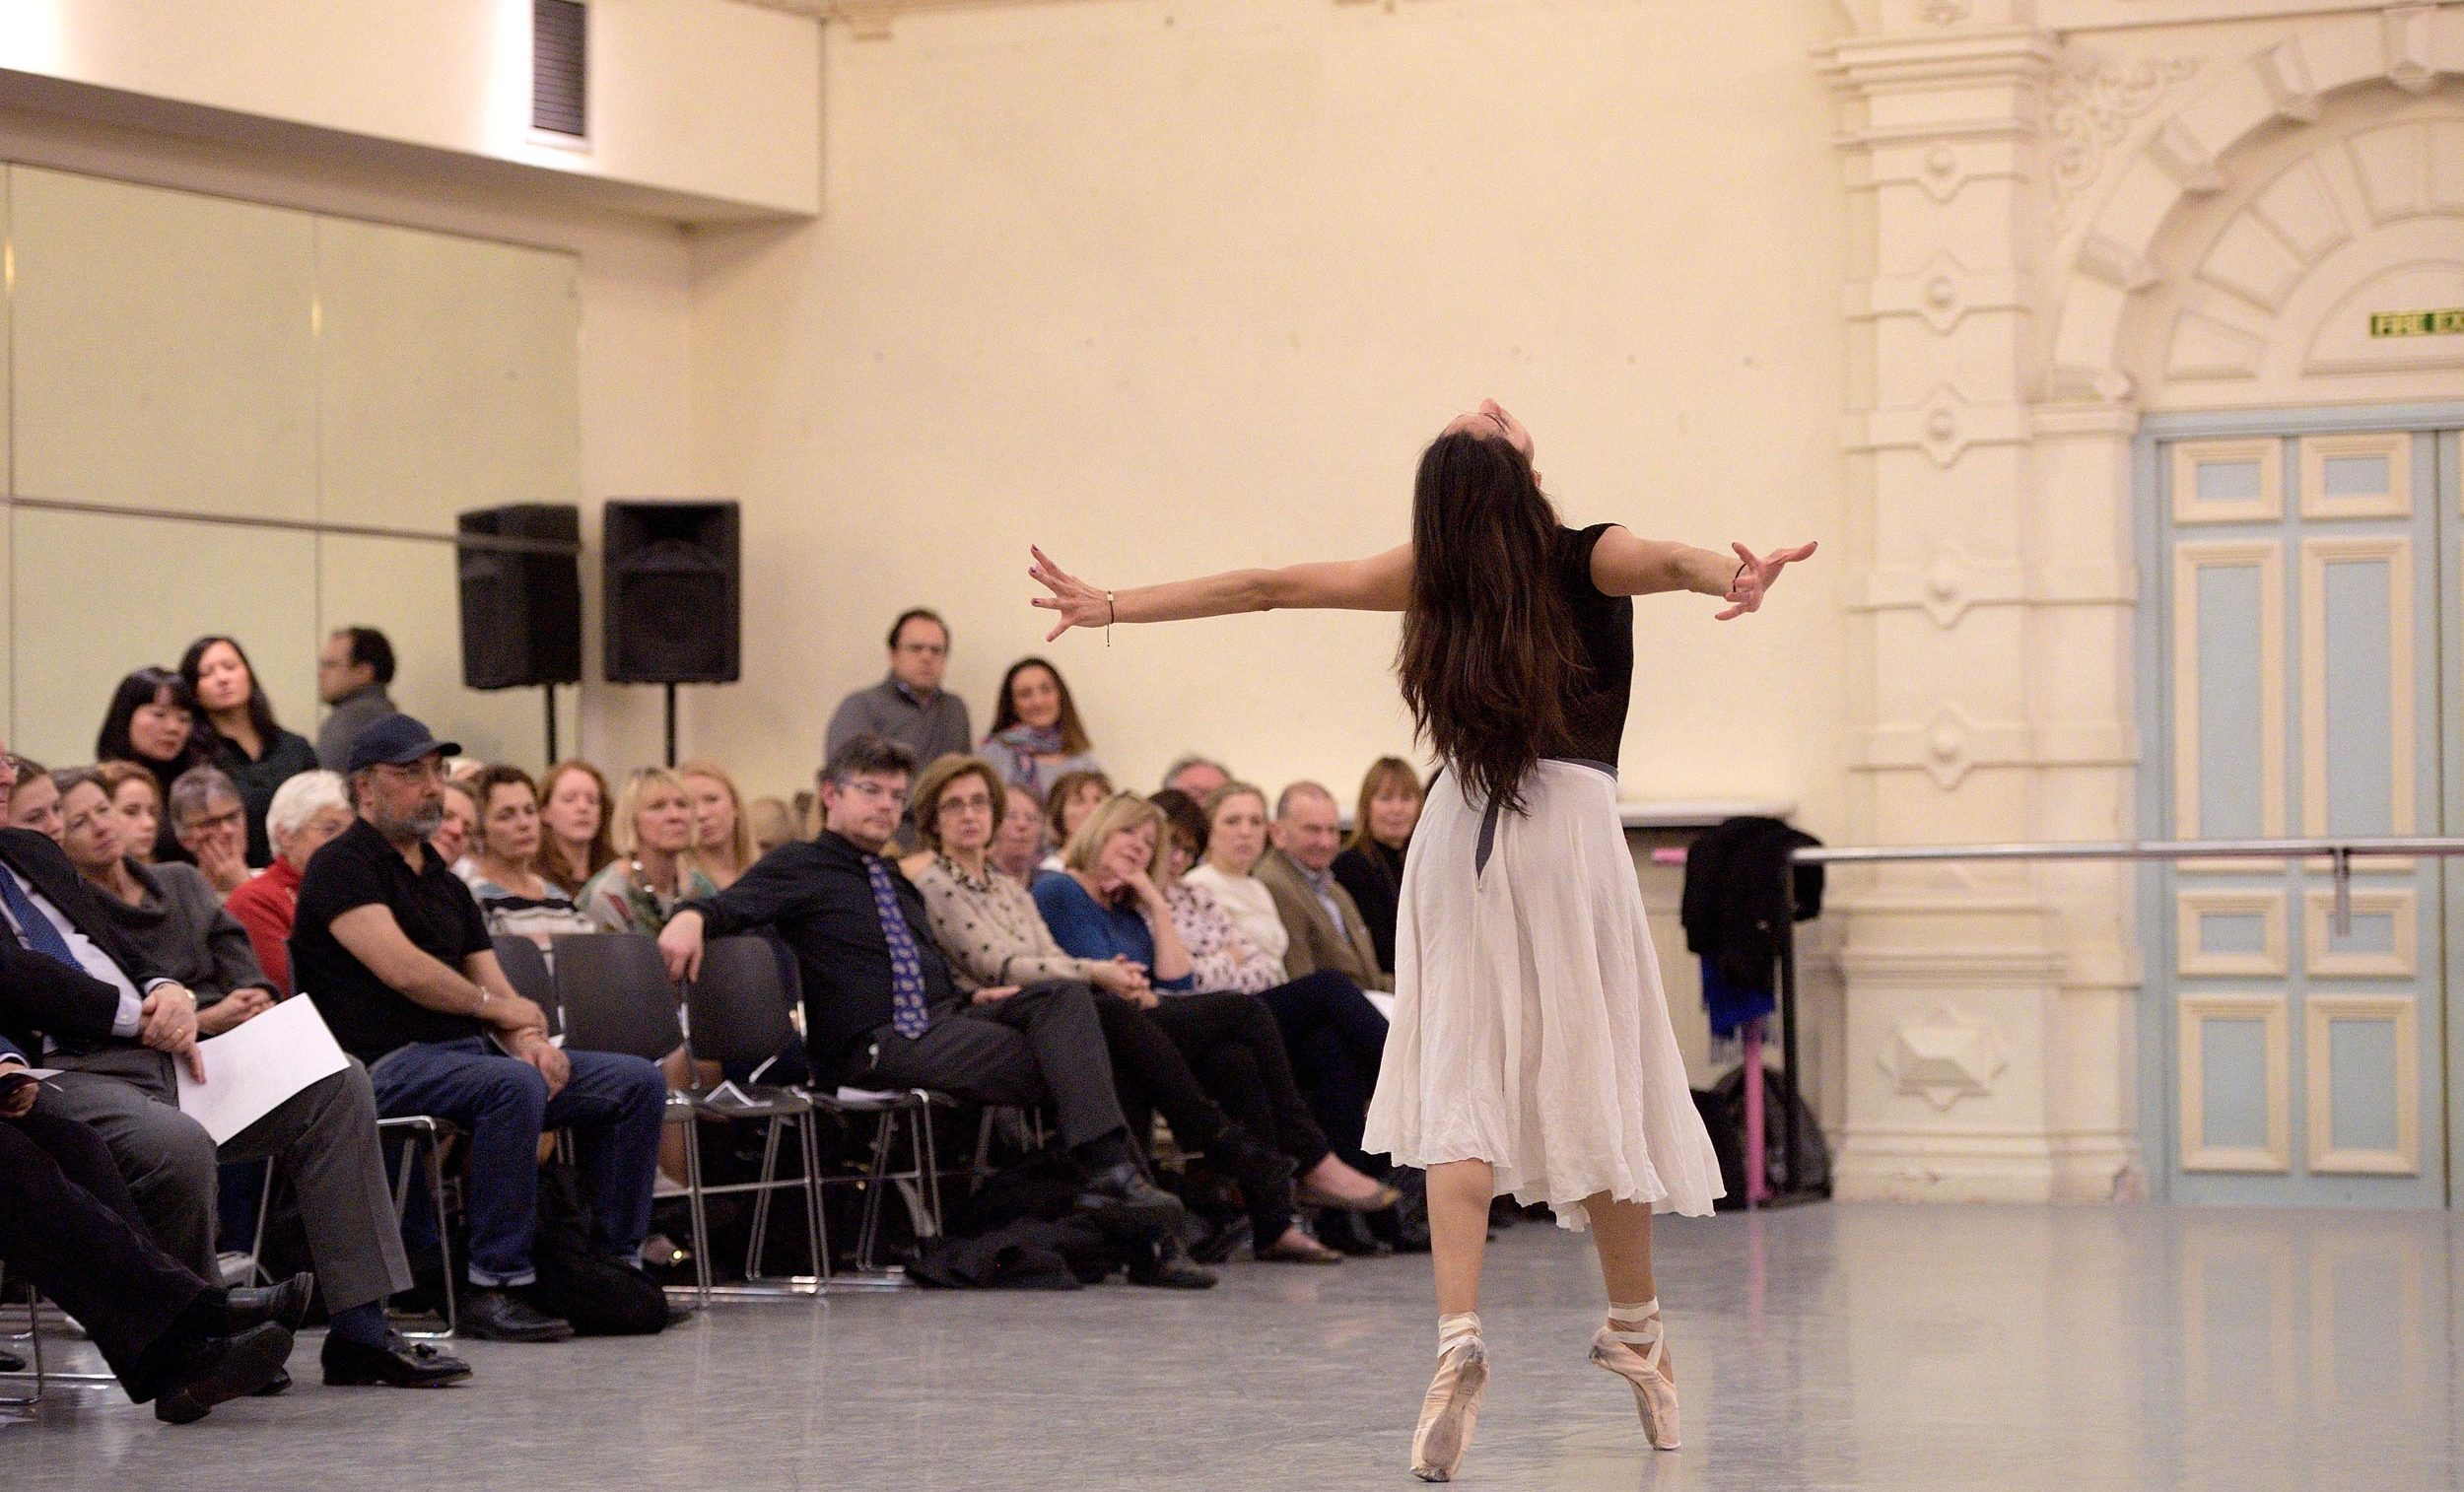 Dancer in the Spotlight: Sarah Kundi © Laurent Liotardo